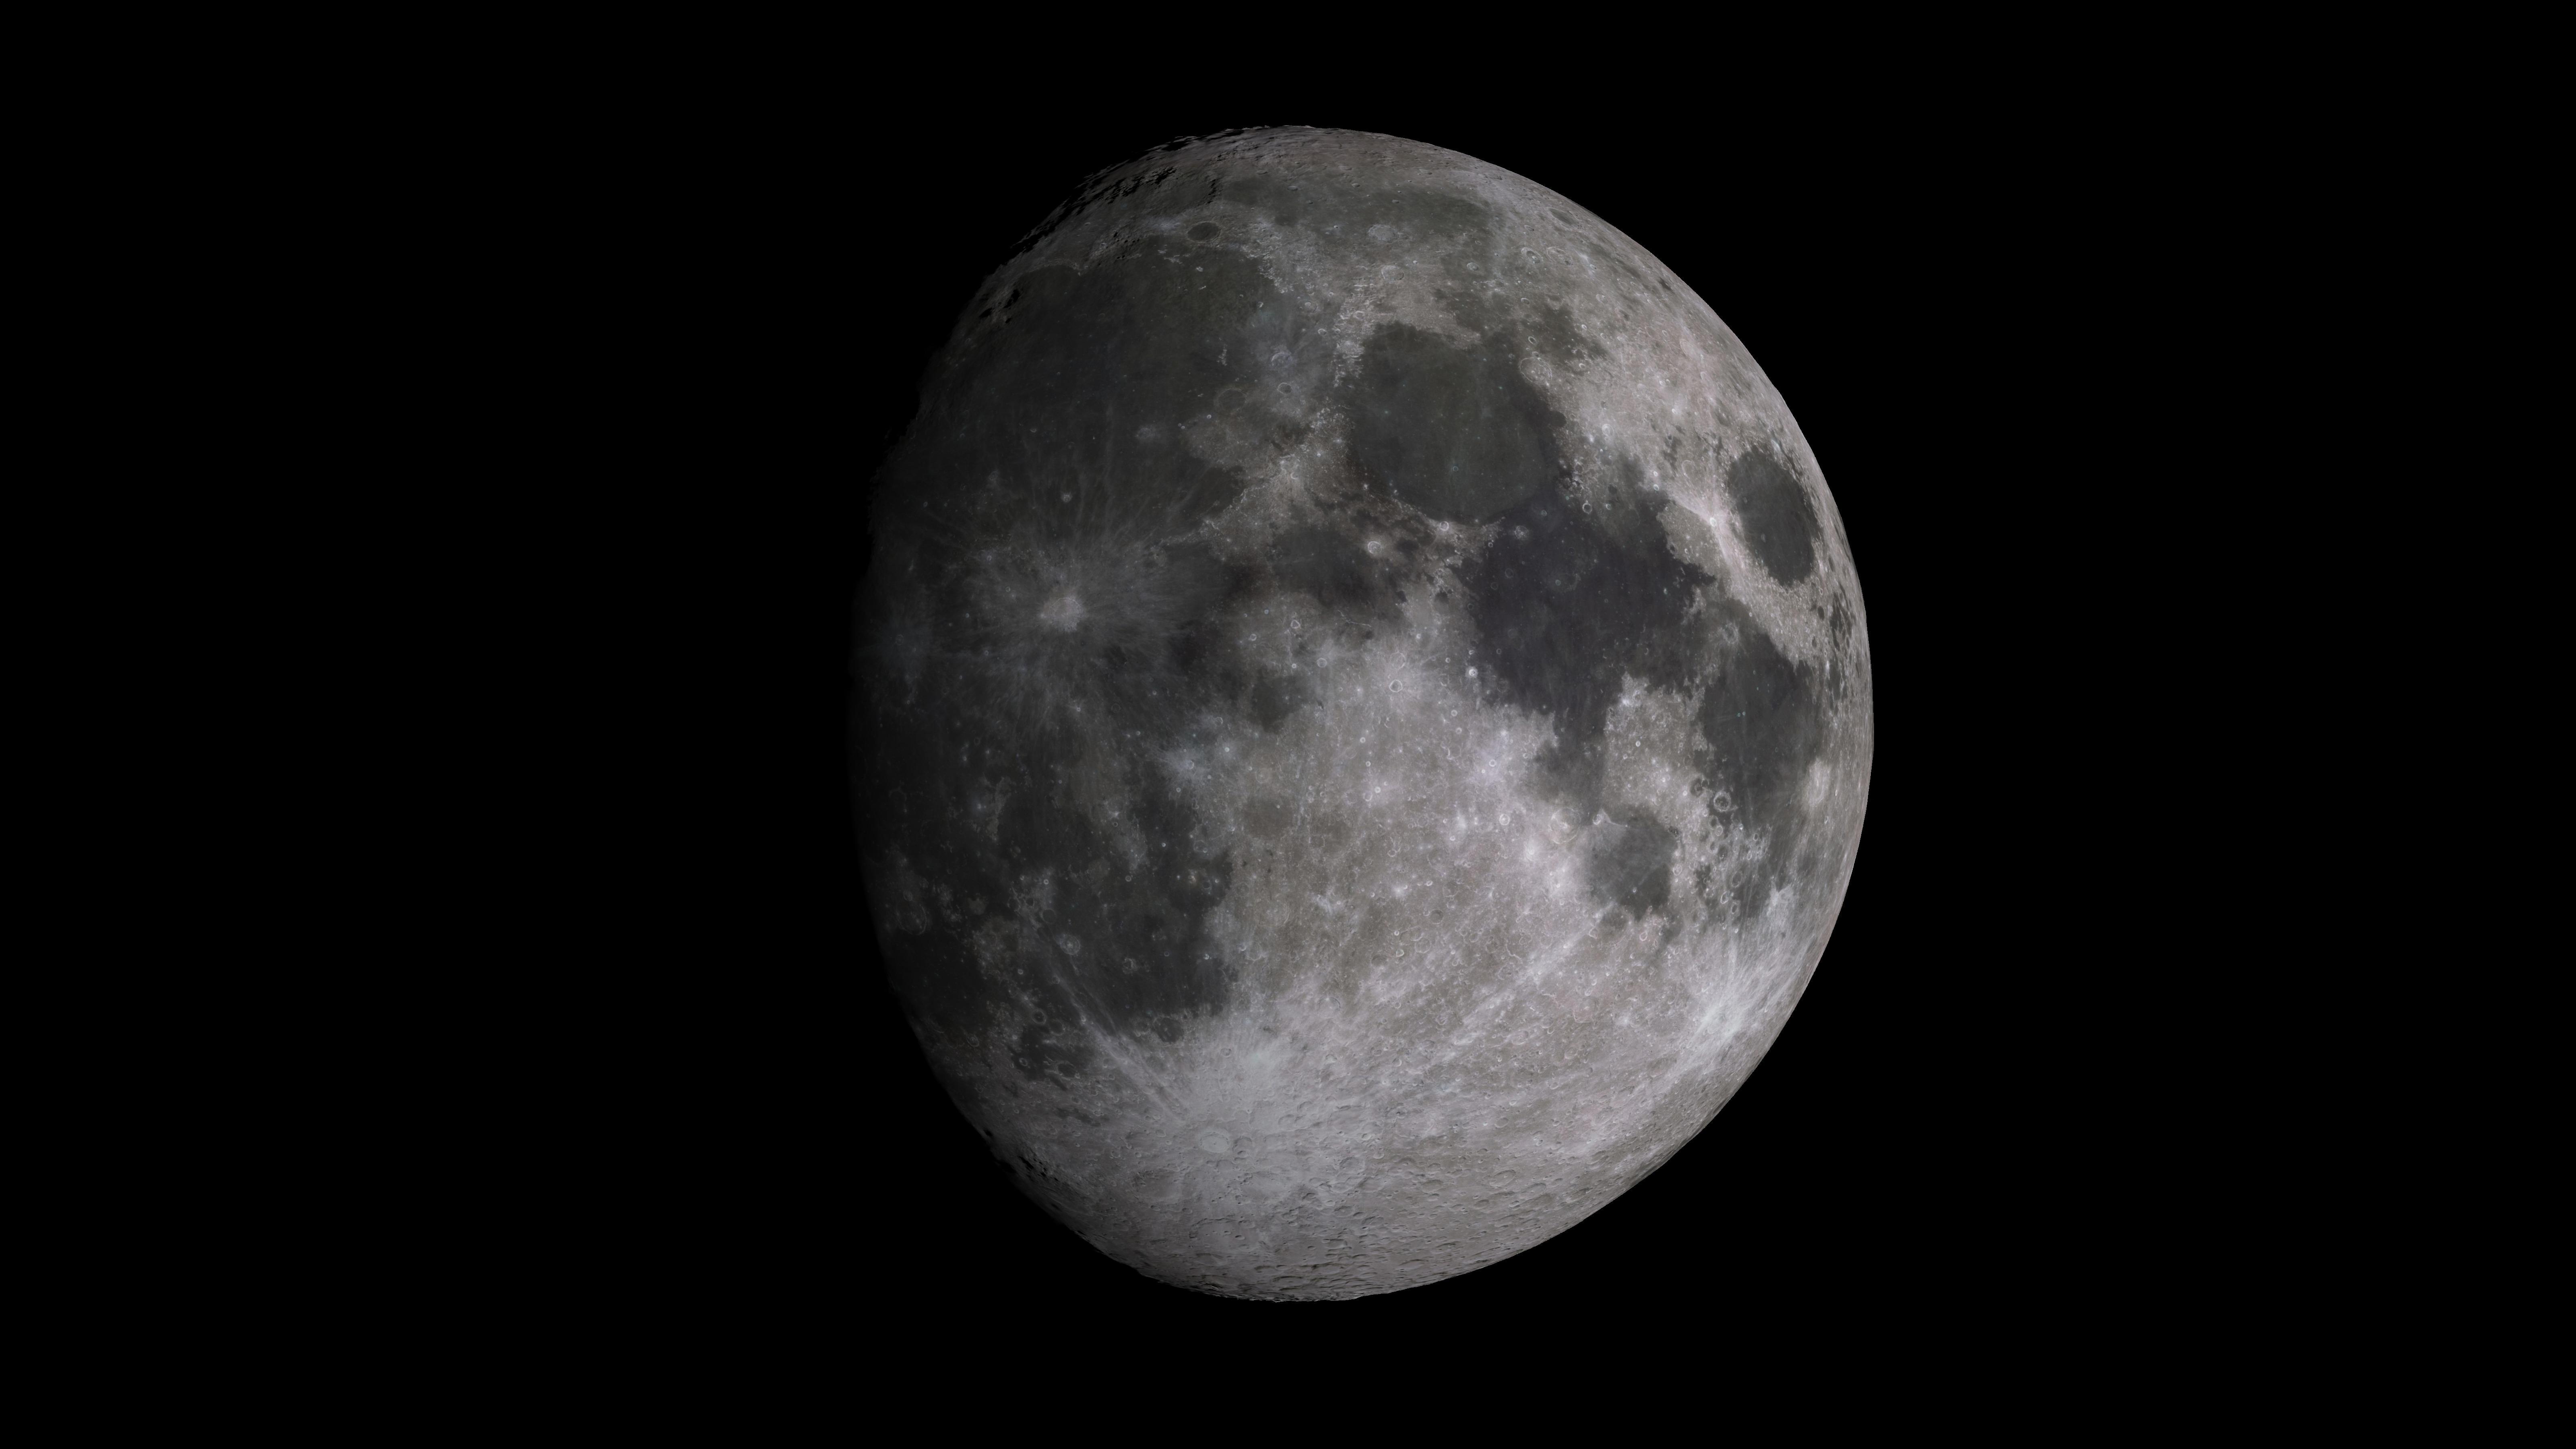 Svs Lro Lola Lunar South Pole Flyover